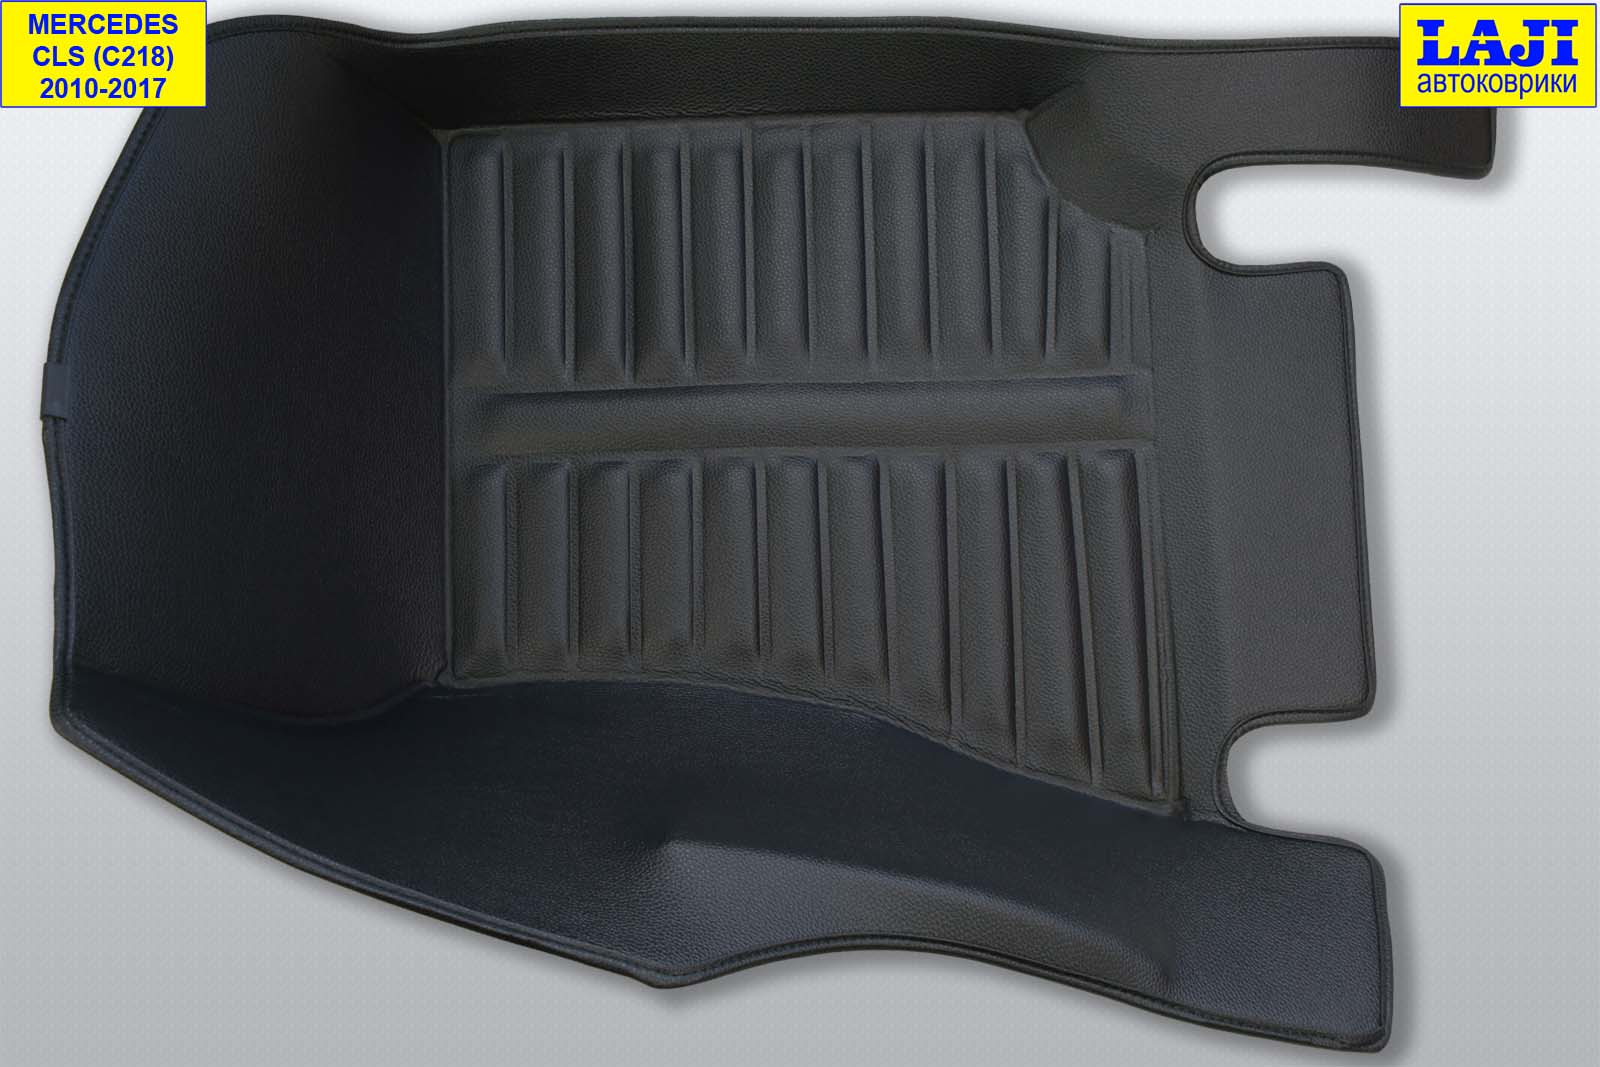 5D коврики в салон Mercedes CLS C218 2010-2017 5